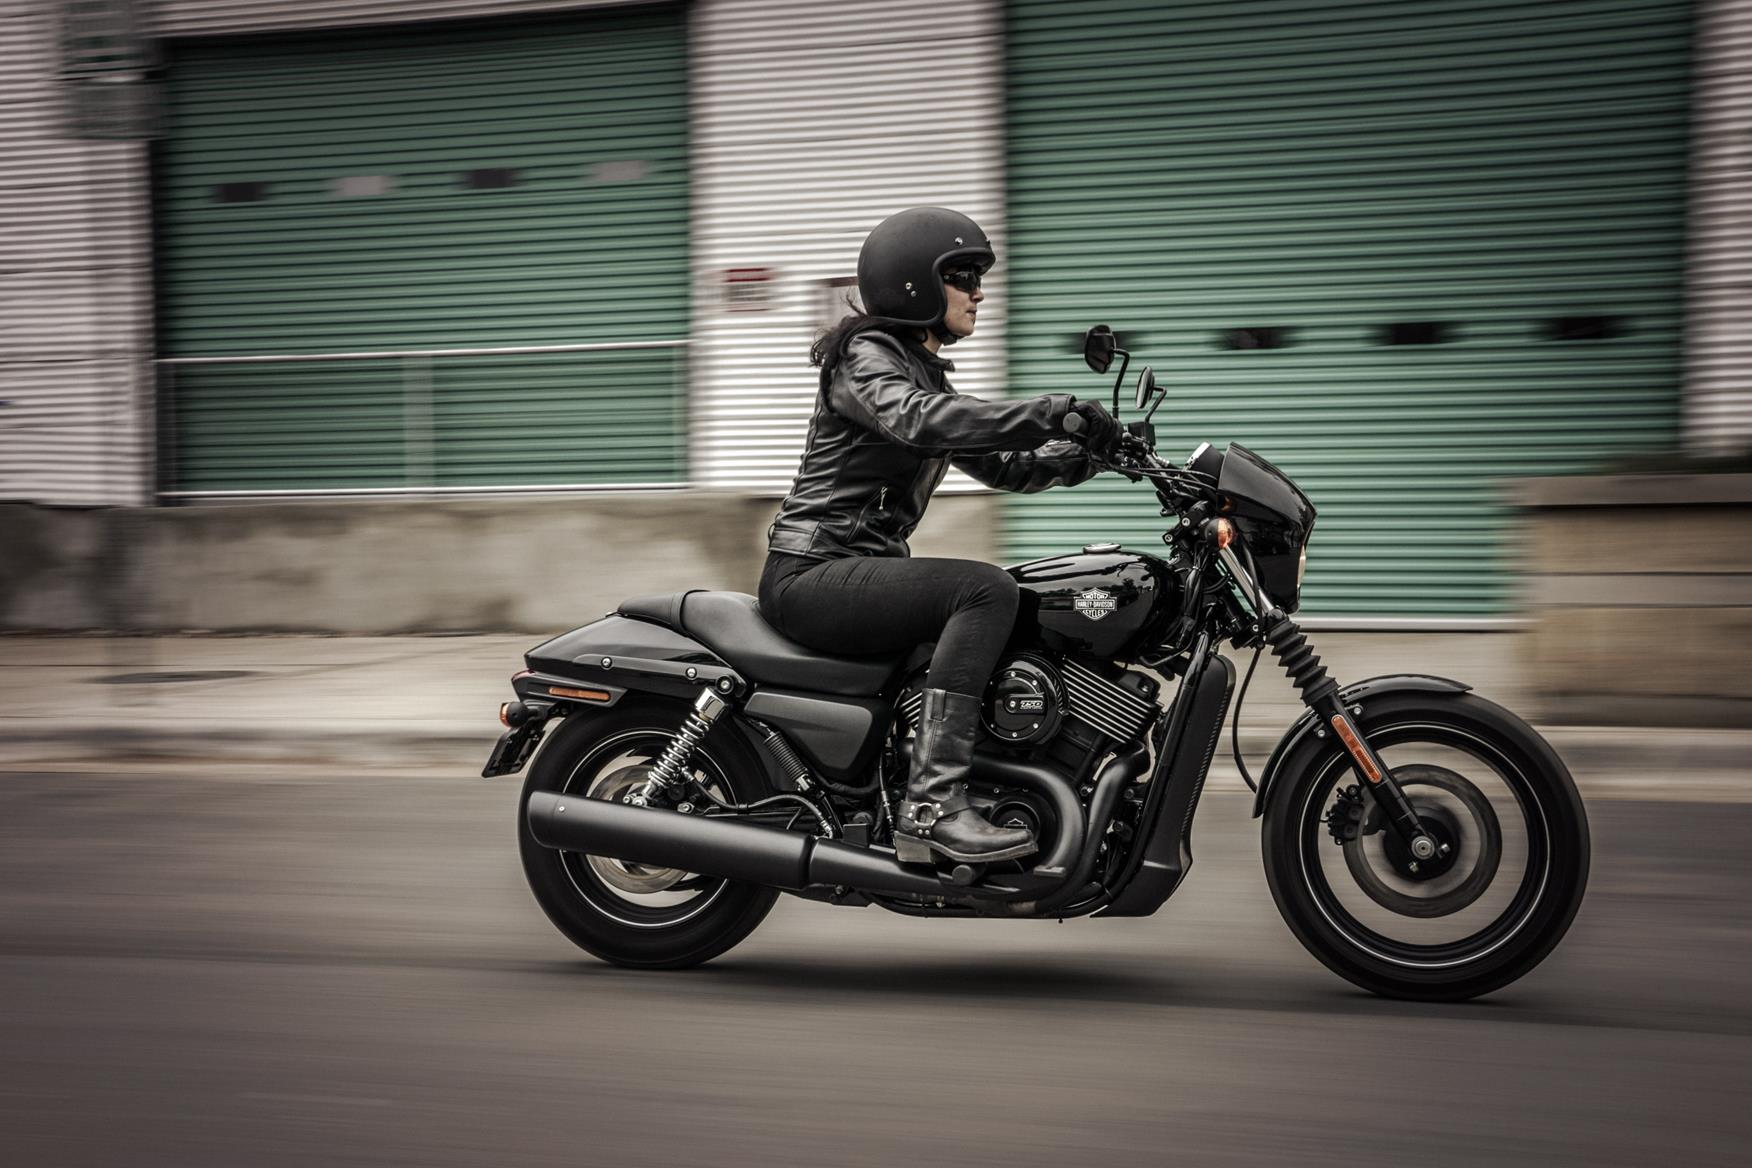 2015 Harley Davidson Street 750 Specs >> Harley-Davidson Street 750 first ride incoming | MCN